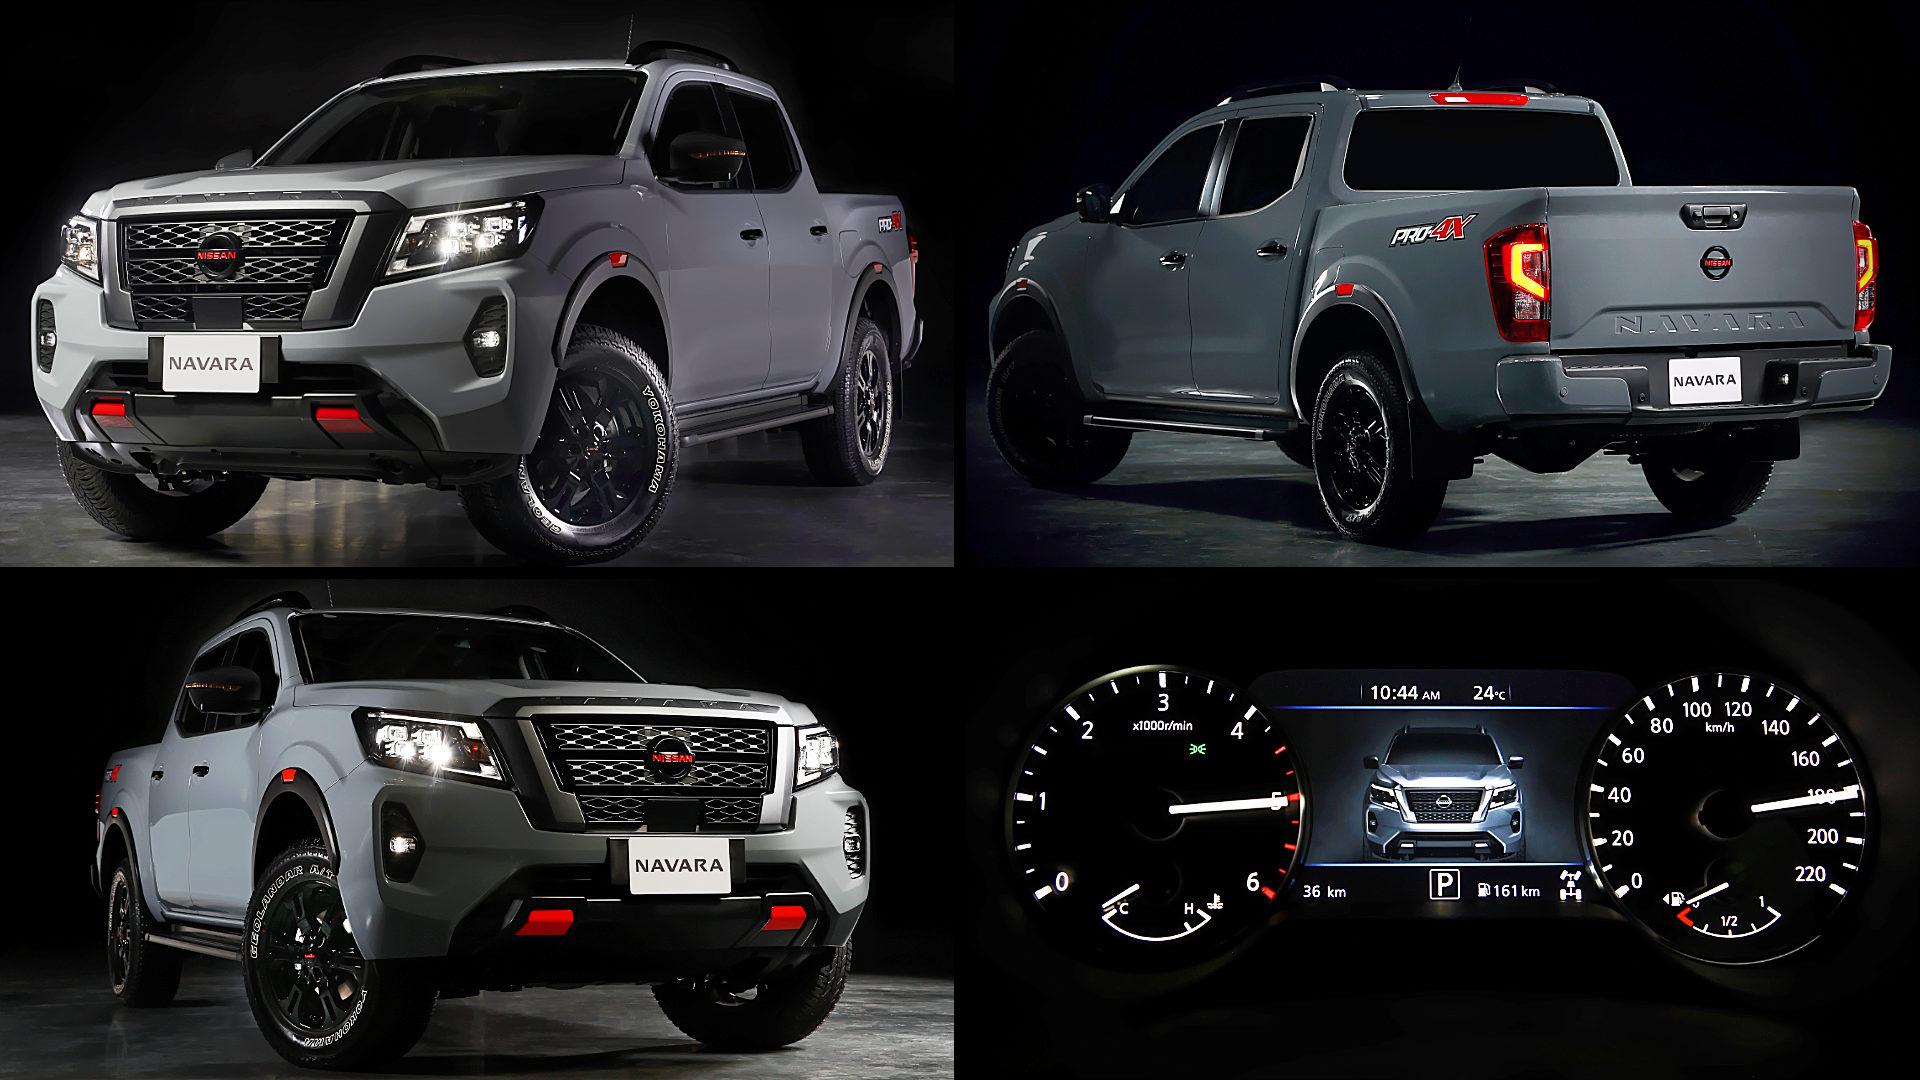 2021 Nissan Navara PRO-4X Pickup